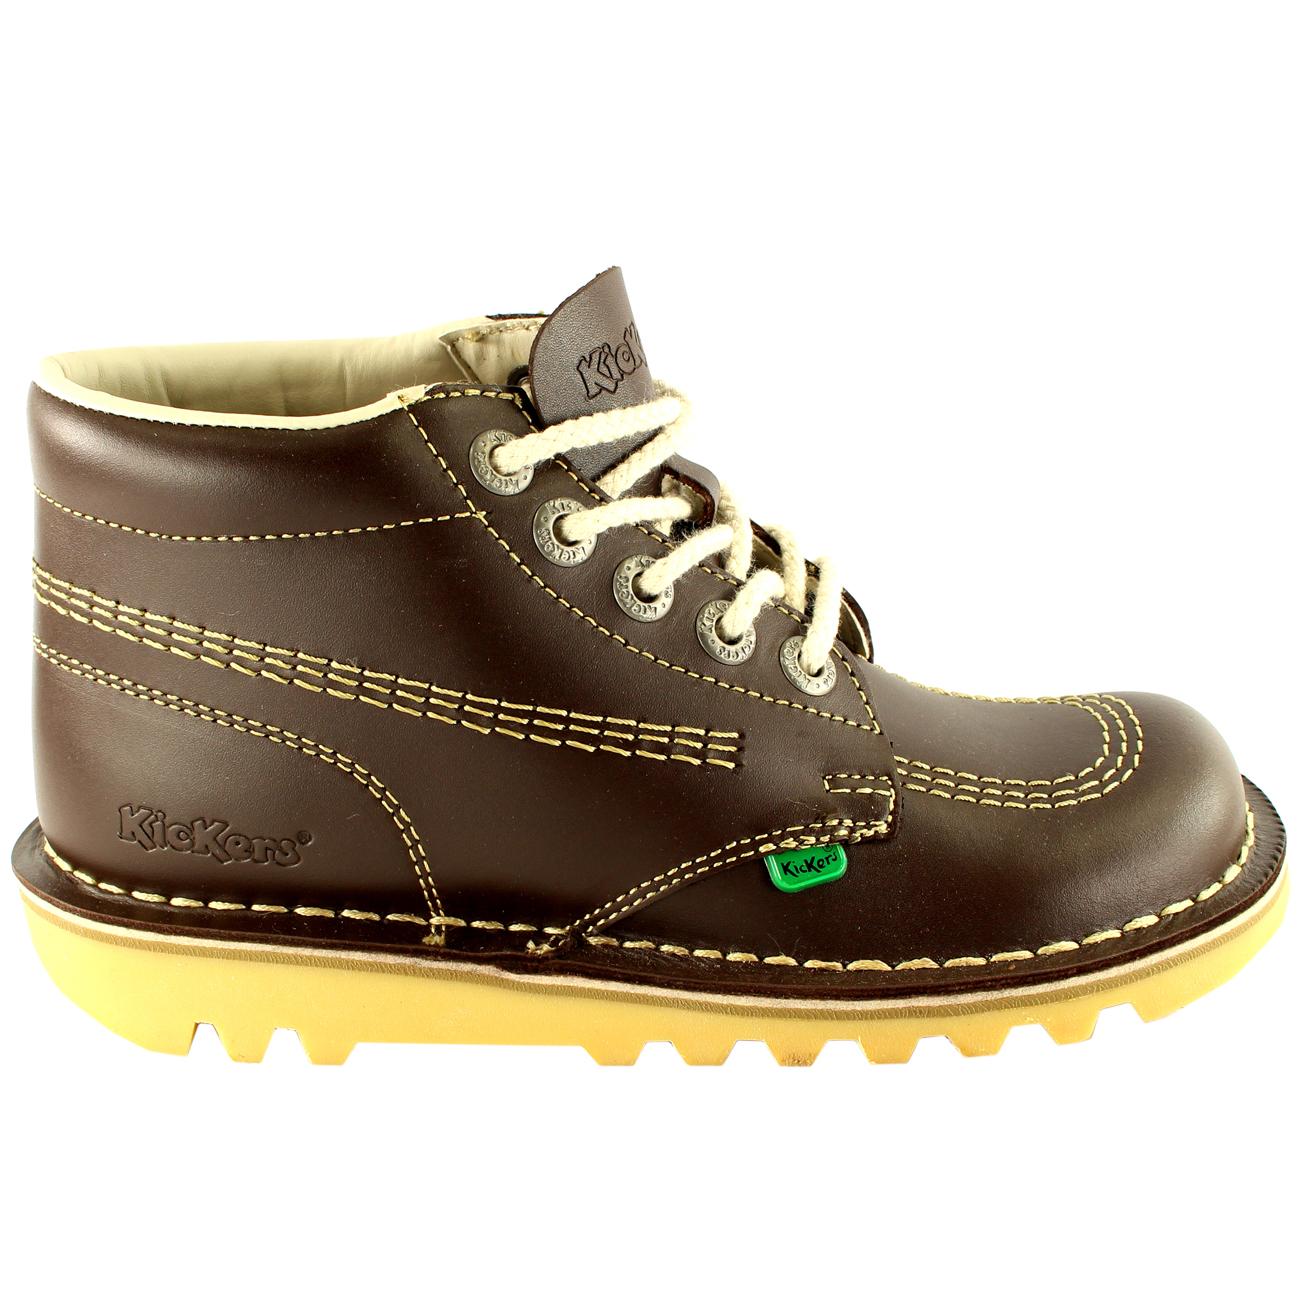 Unisex Kids Junior Kickers Kick Hi Back To School Leather Boot Shoes ... 91b8b082694